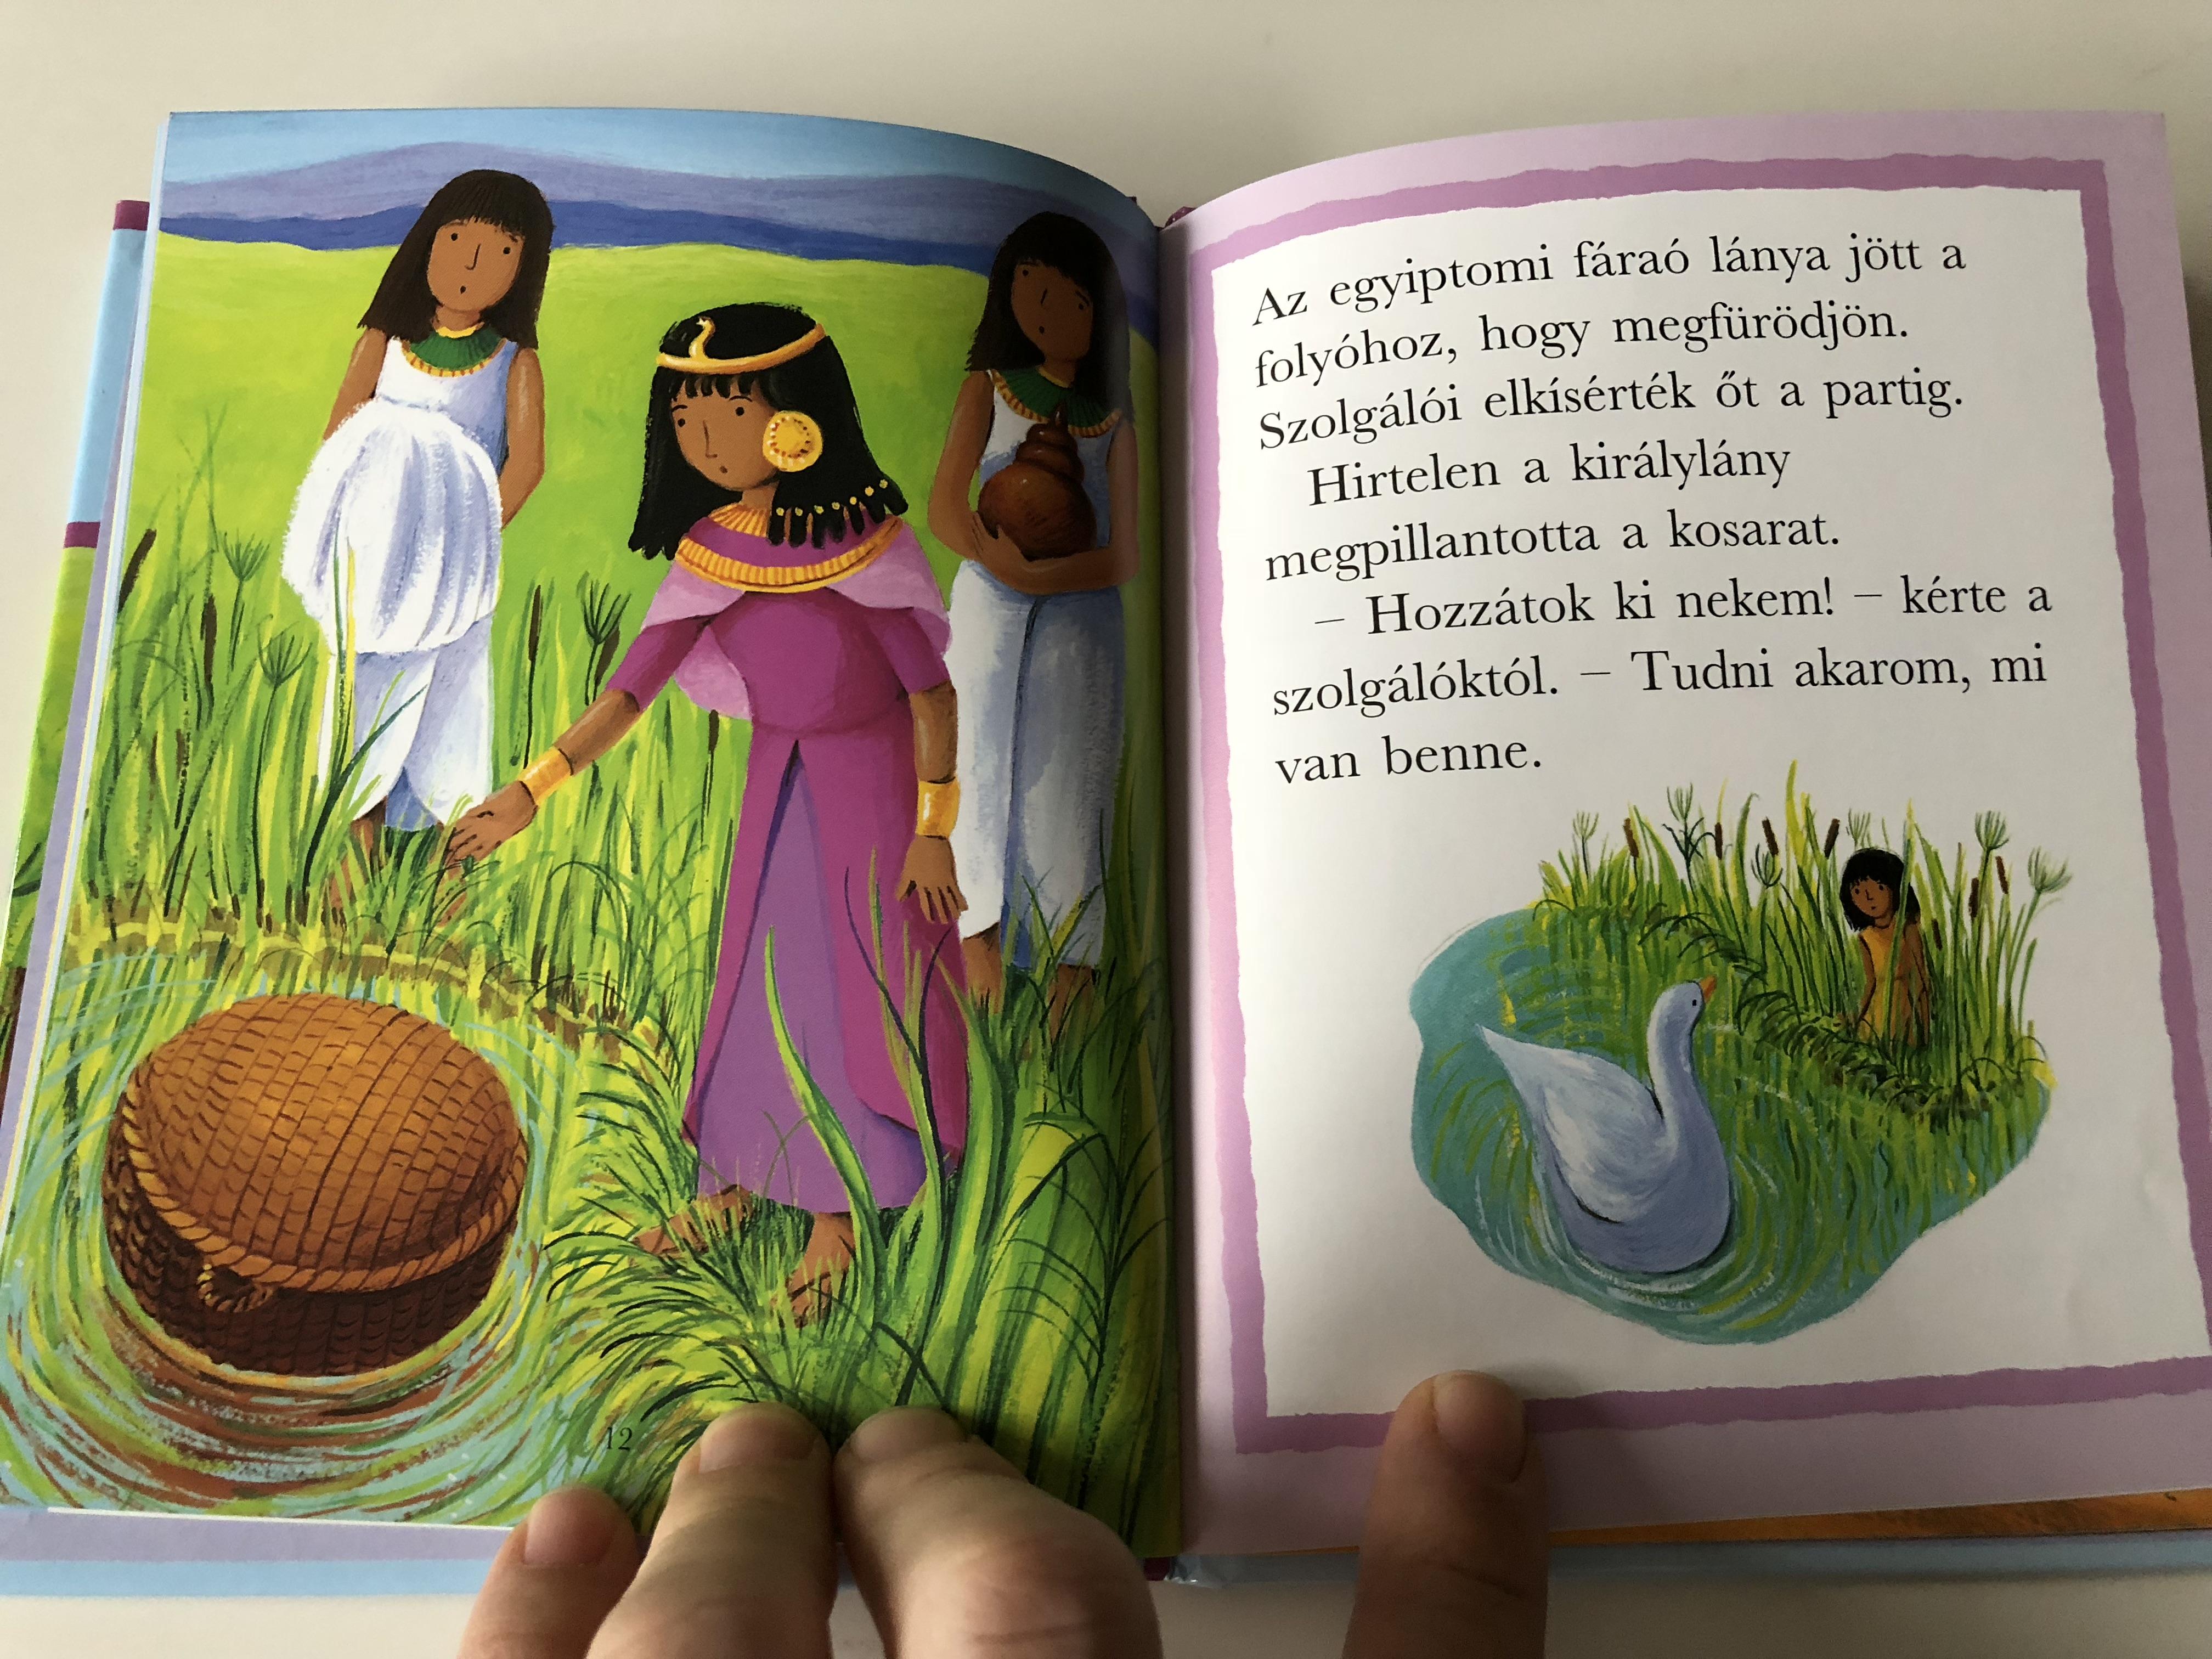 m-zes-moses-and-the-princess-in-hungarian-language-lion-hudson-sophie-piper-estelle-corke-hardcover-t-rt-netek-bibliai-id-kb-l-besz-l-hal-kft-5-.jpg